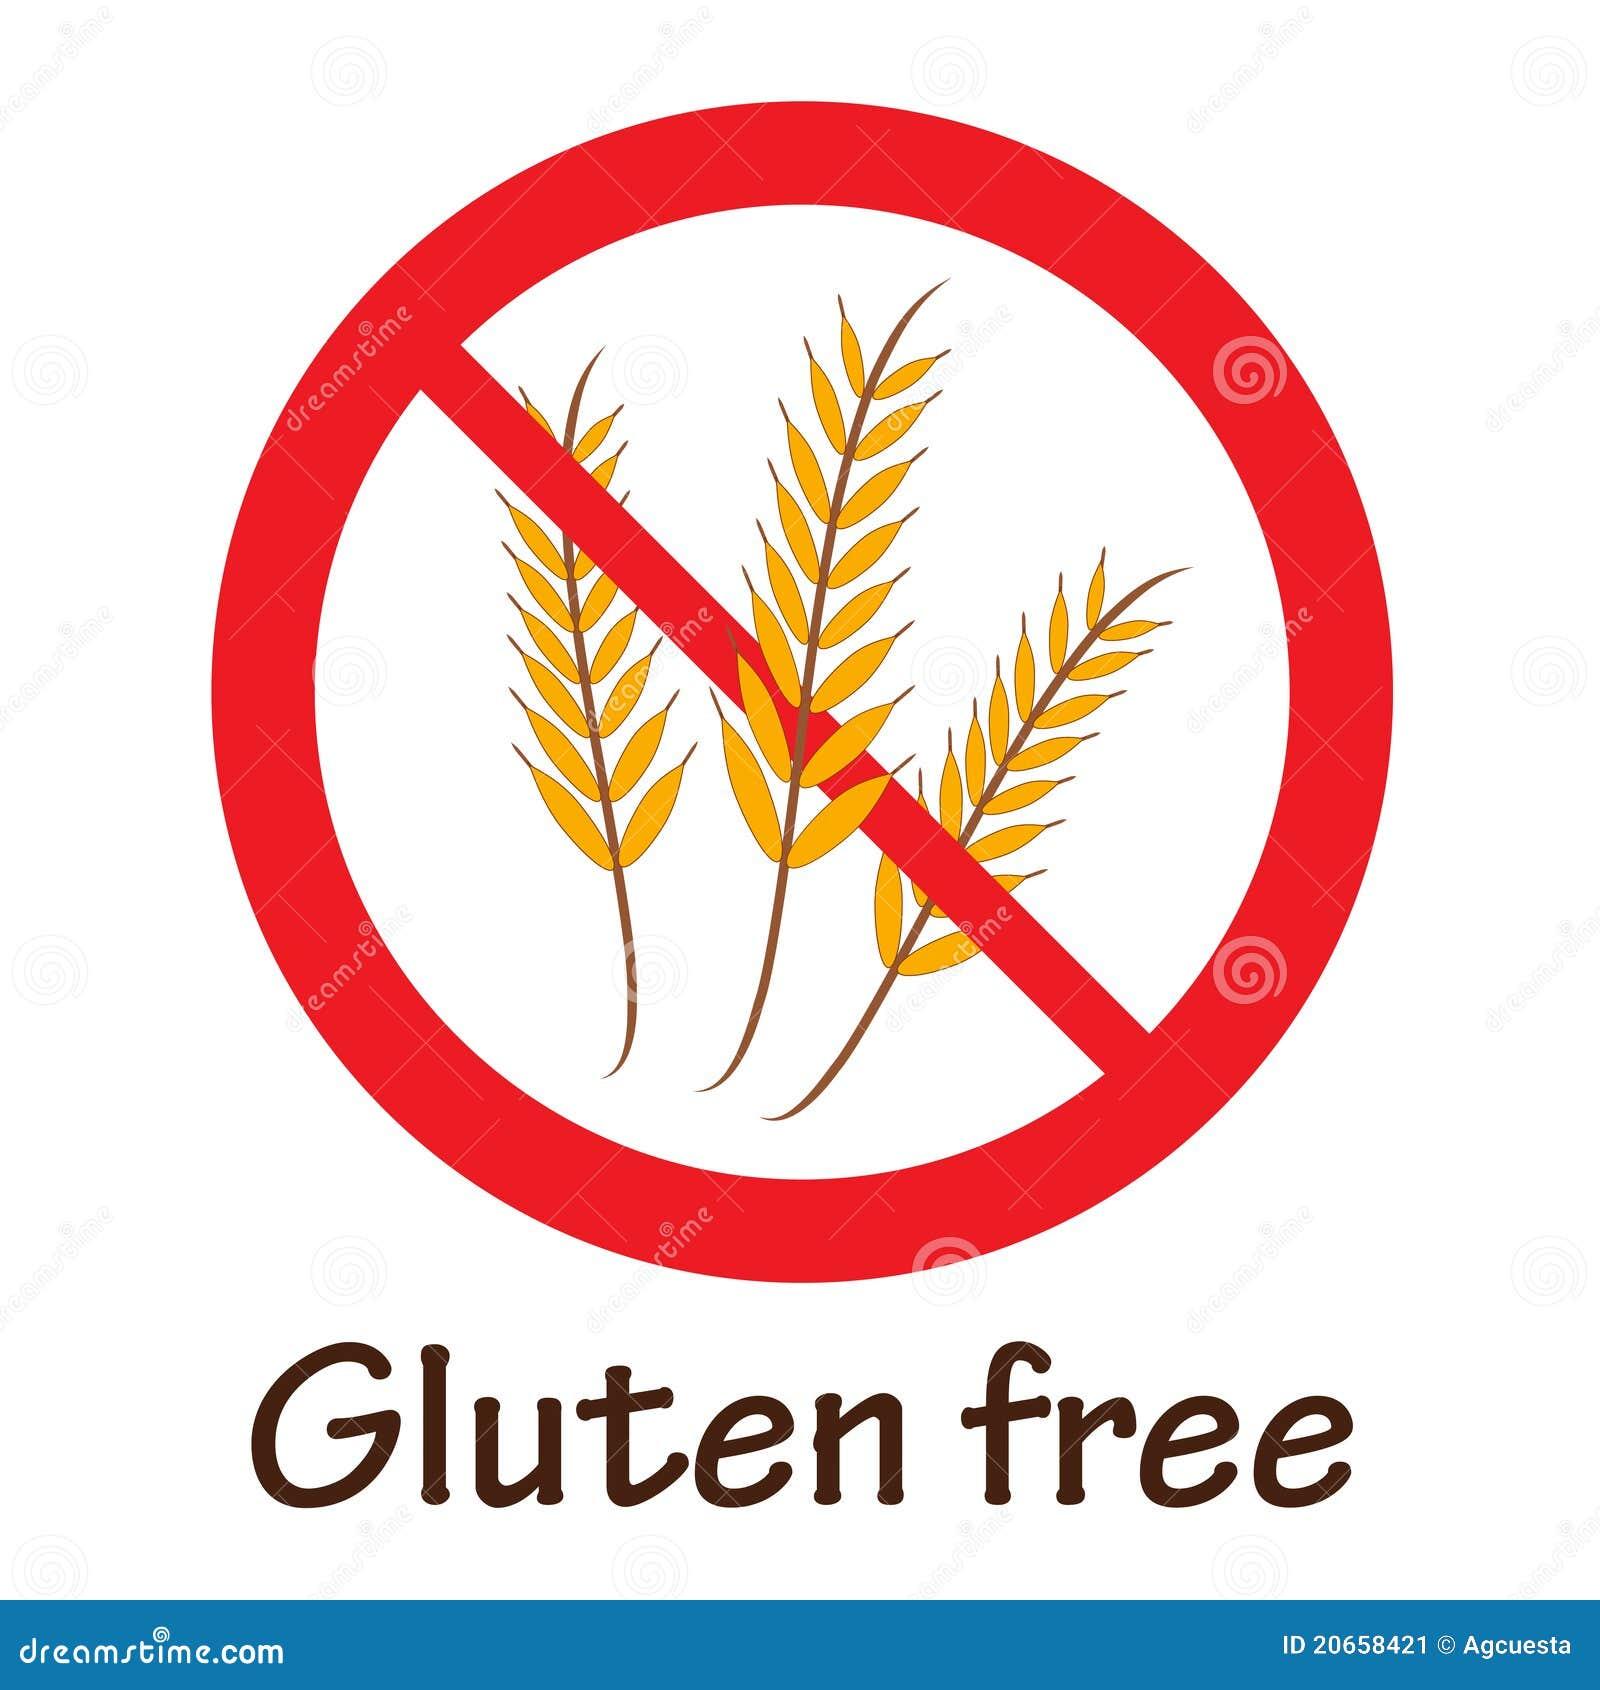 Gluten-free Symbol Stock Image - Image: 20658421